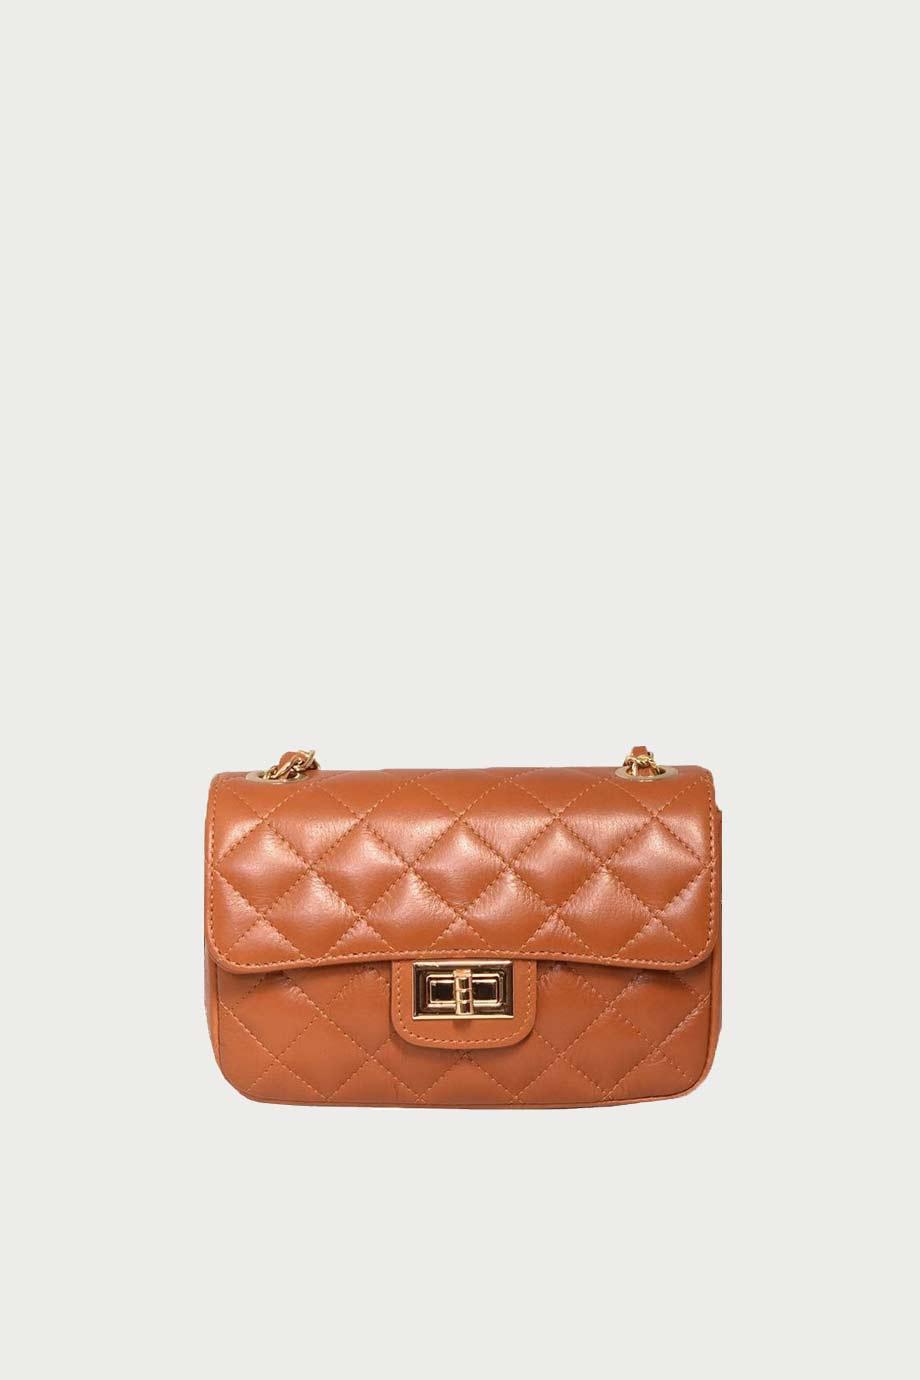 spiridoula metheniti shoes xalkida p ss17 7105 cuoio side bag leather chain 19v69